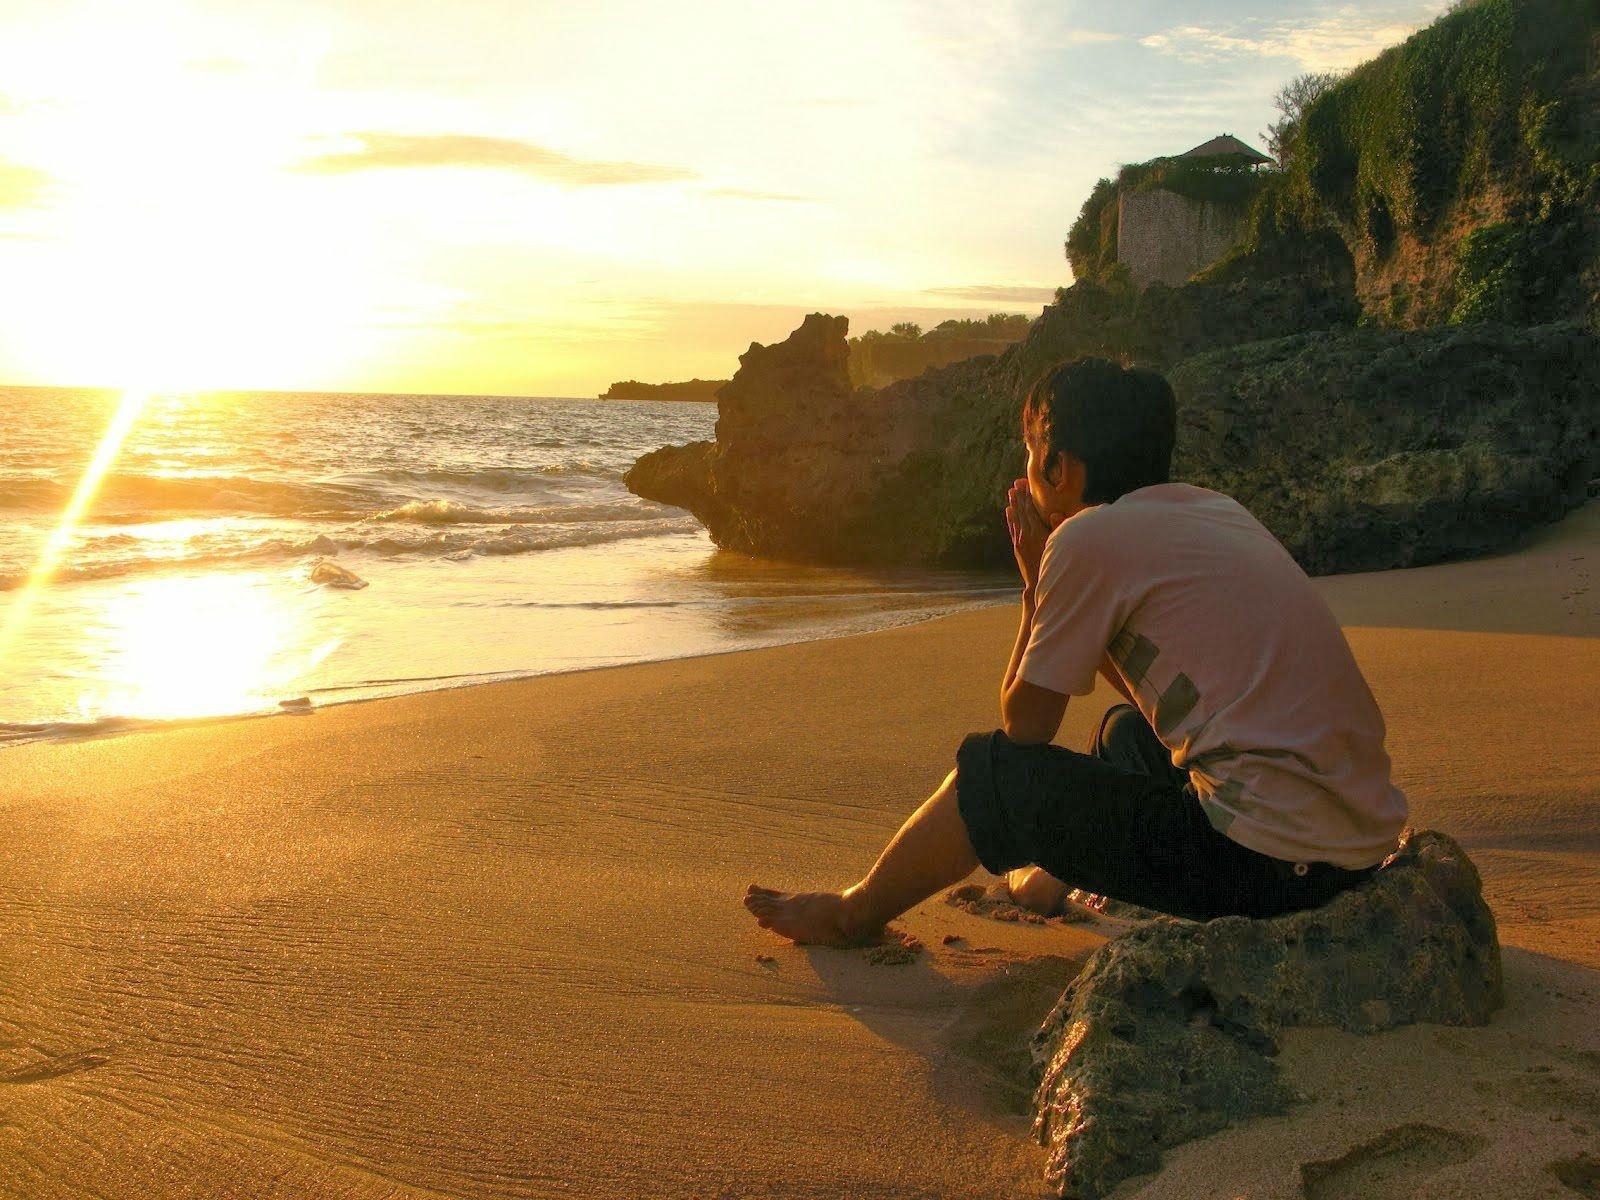 Lonely mood sad alone sadness emotion people loneliness solitude boy man men beach sunset sea ocean wallpaper 1600x1200 648603 wallpaperup